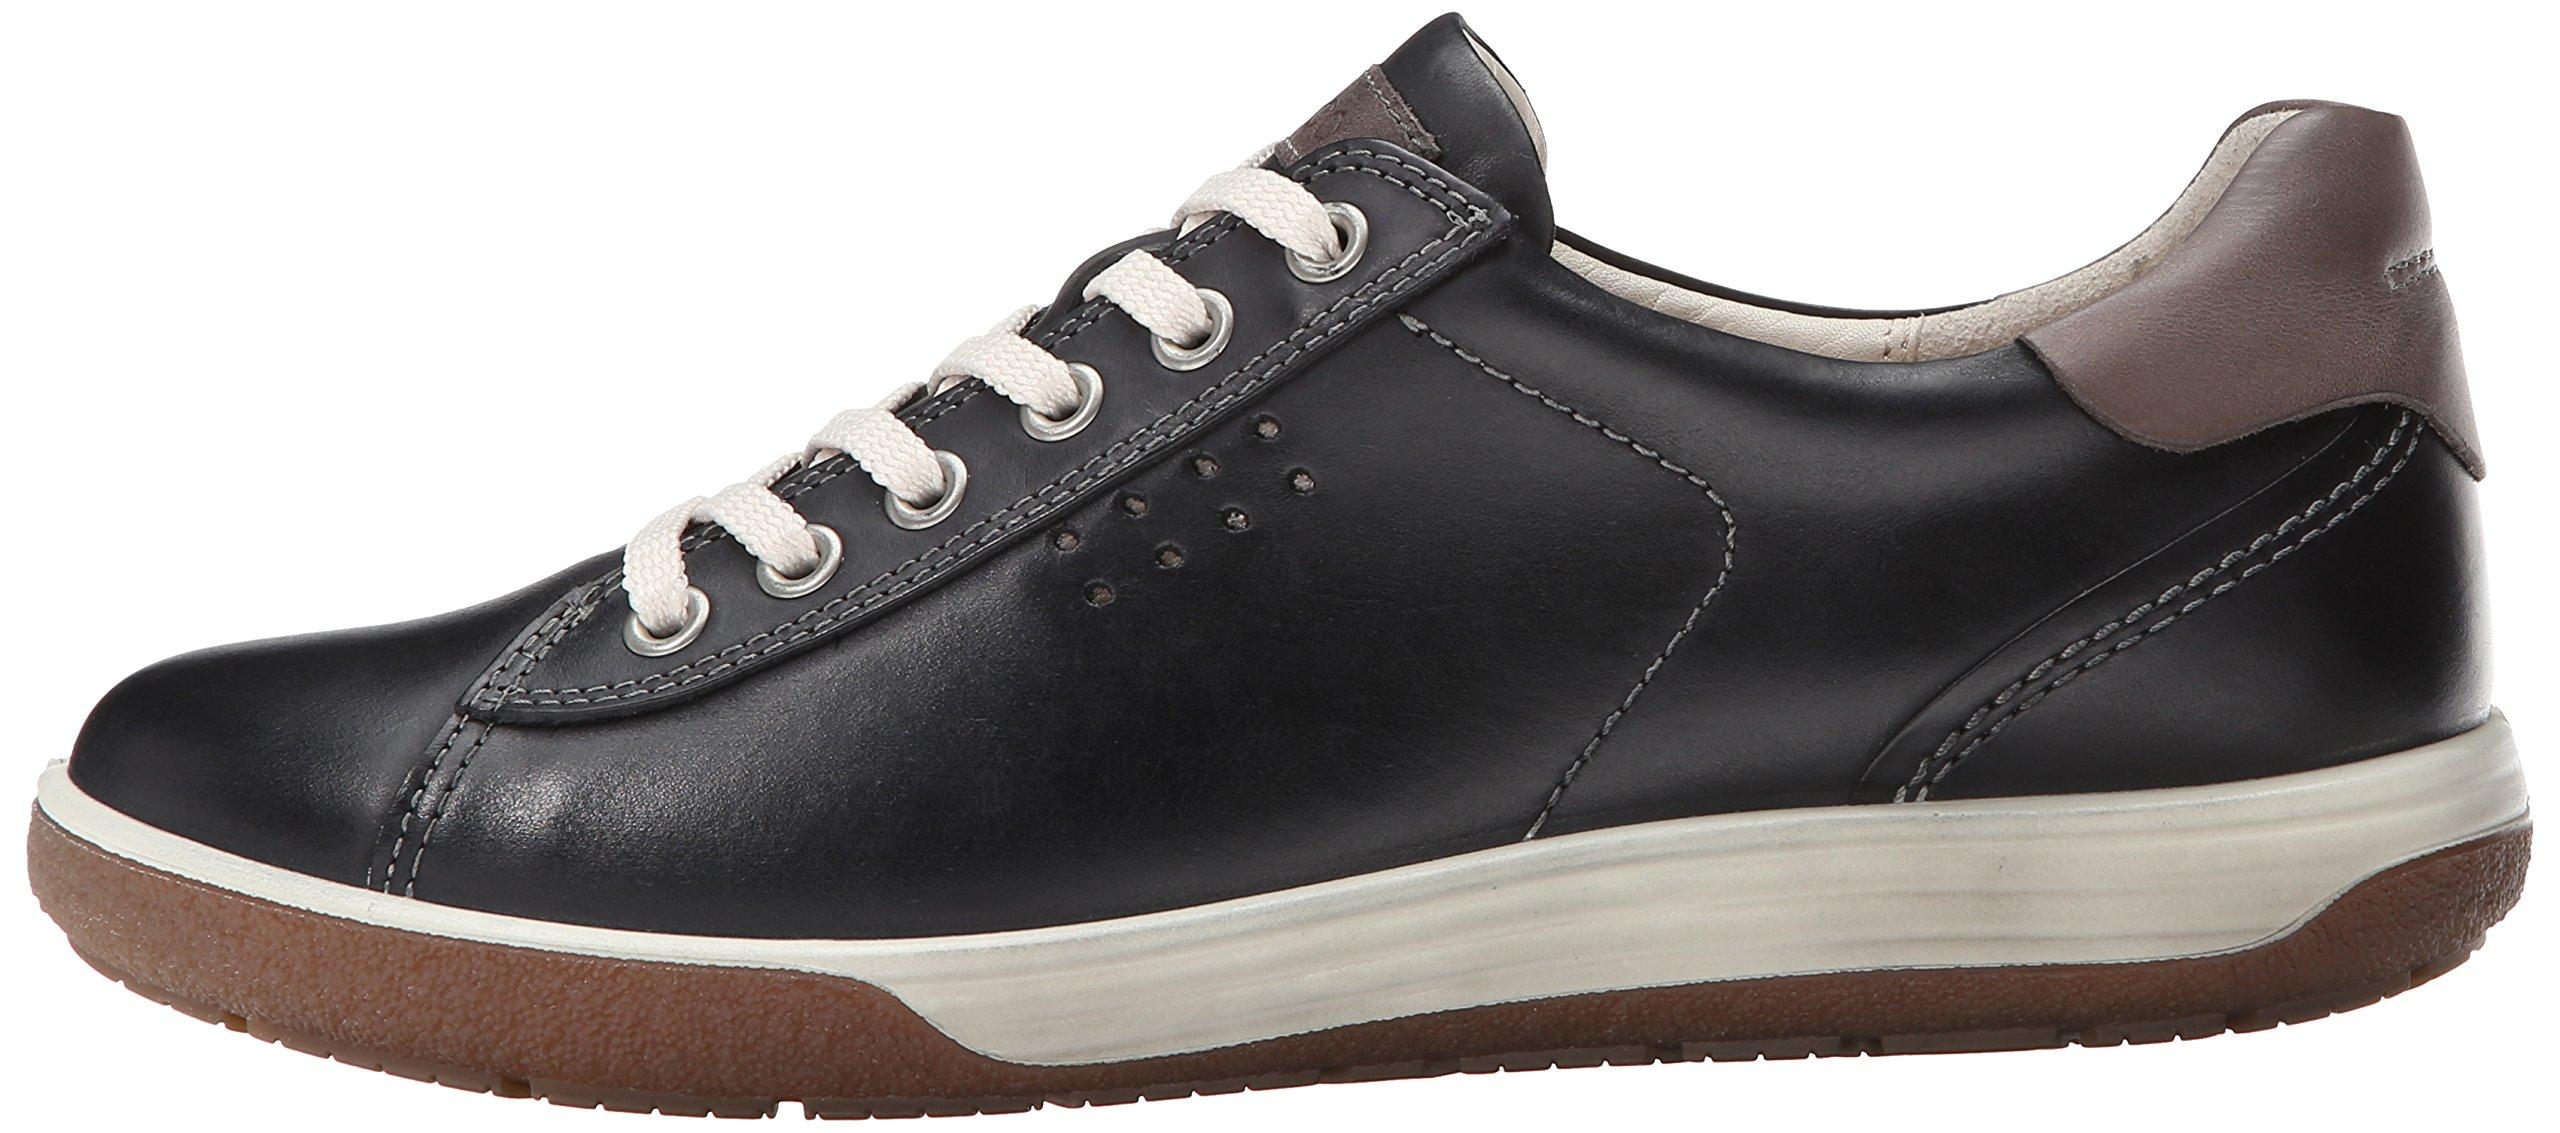 Ecco Footwear Womens Chase II Lace Shoe, Black, 39 EU/8-8.5 M US by ECCO (Image #5)